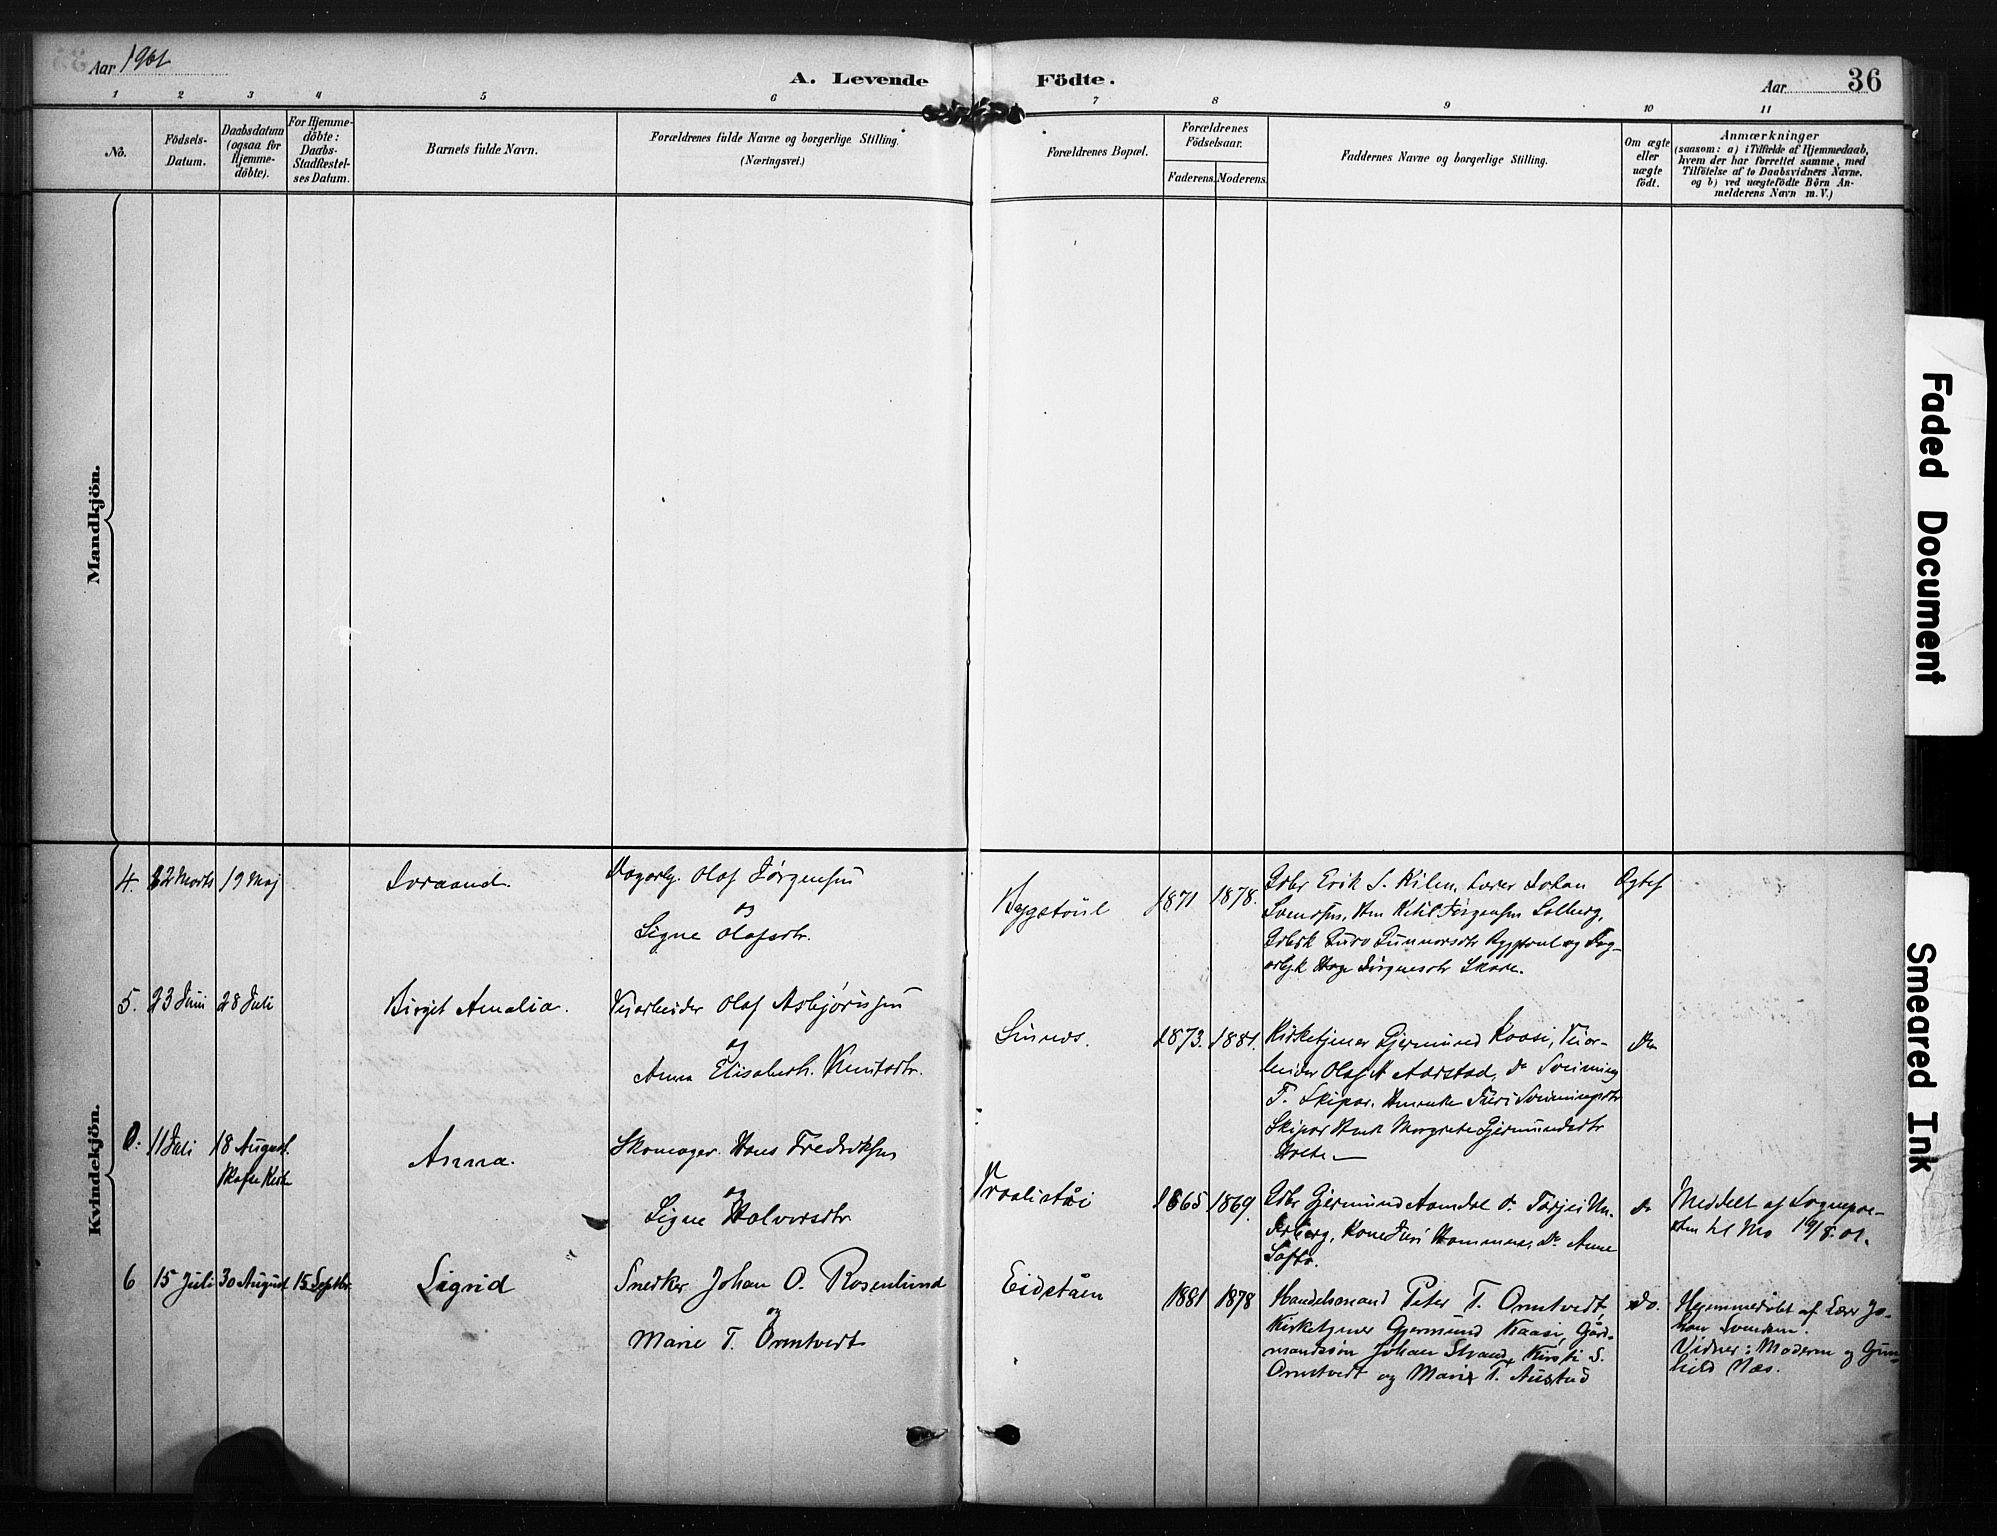 SAKO, Kviteseid kirkebøker, F/Fc/L0002: Ministerialbok nr. III 2, 1882-1908, s. 36